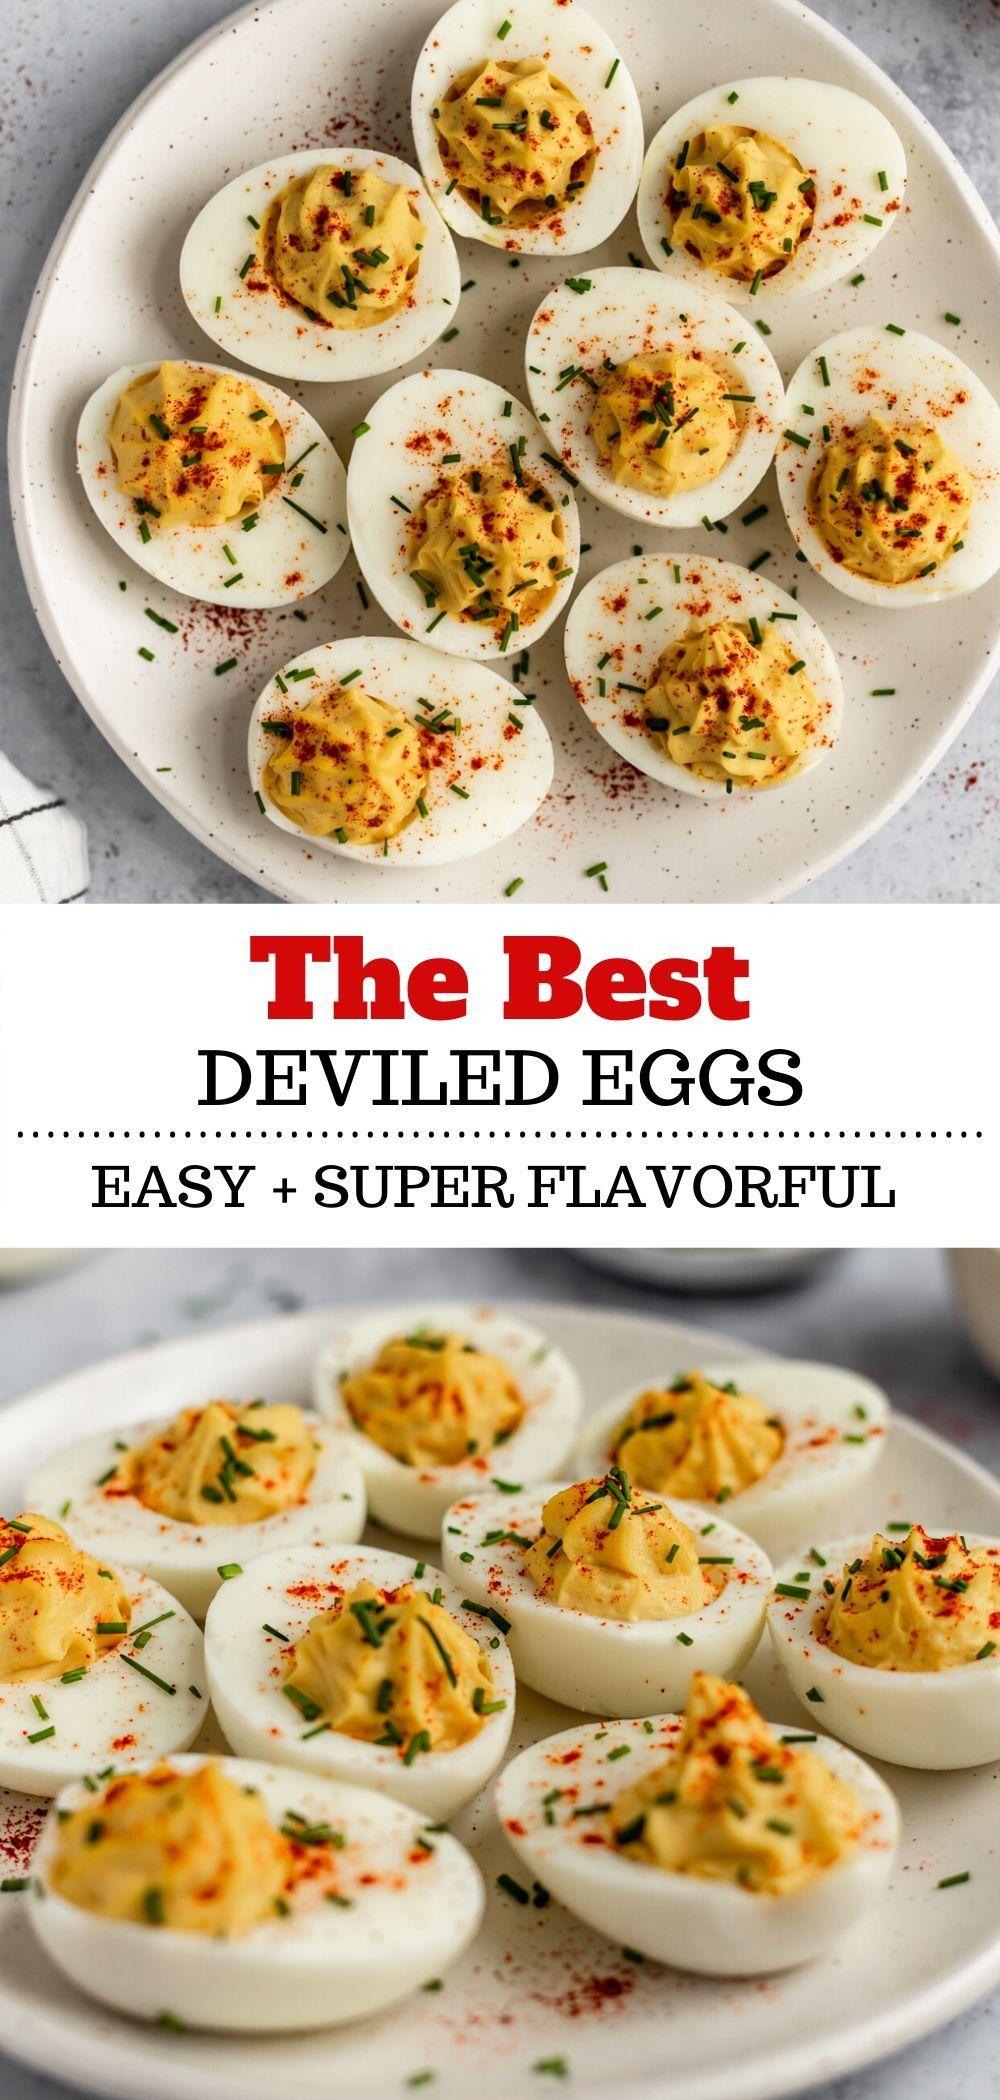 Best Deviled Eggs - Kim's Cravings